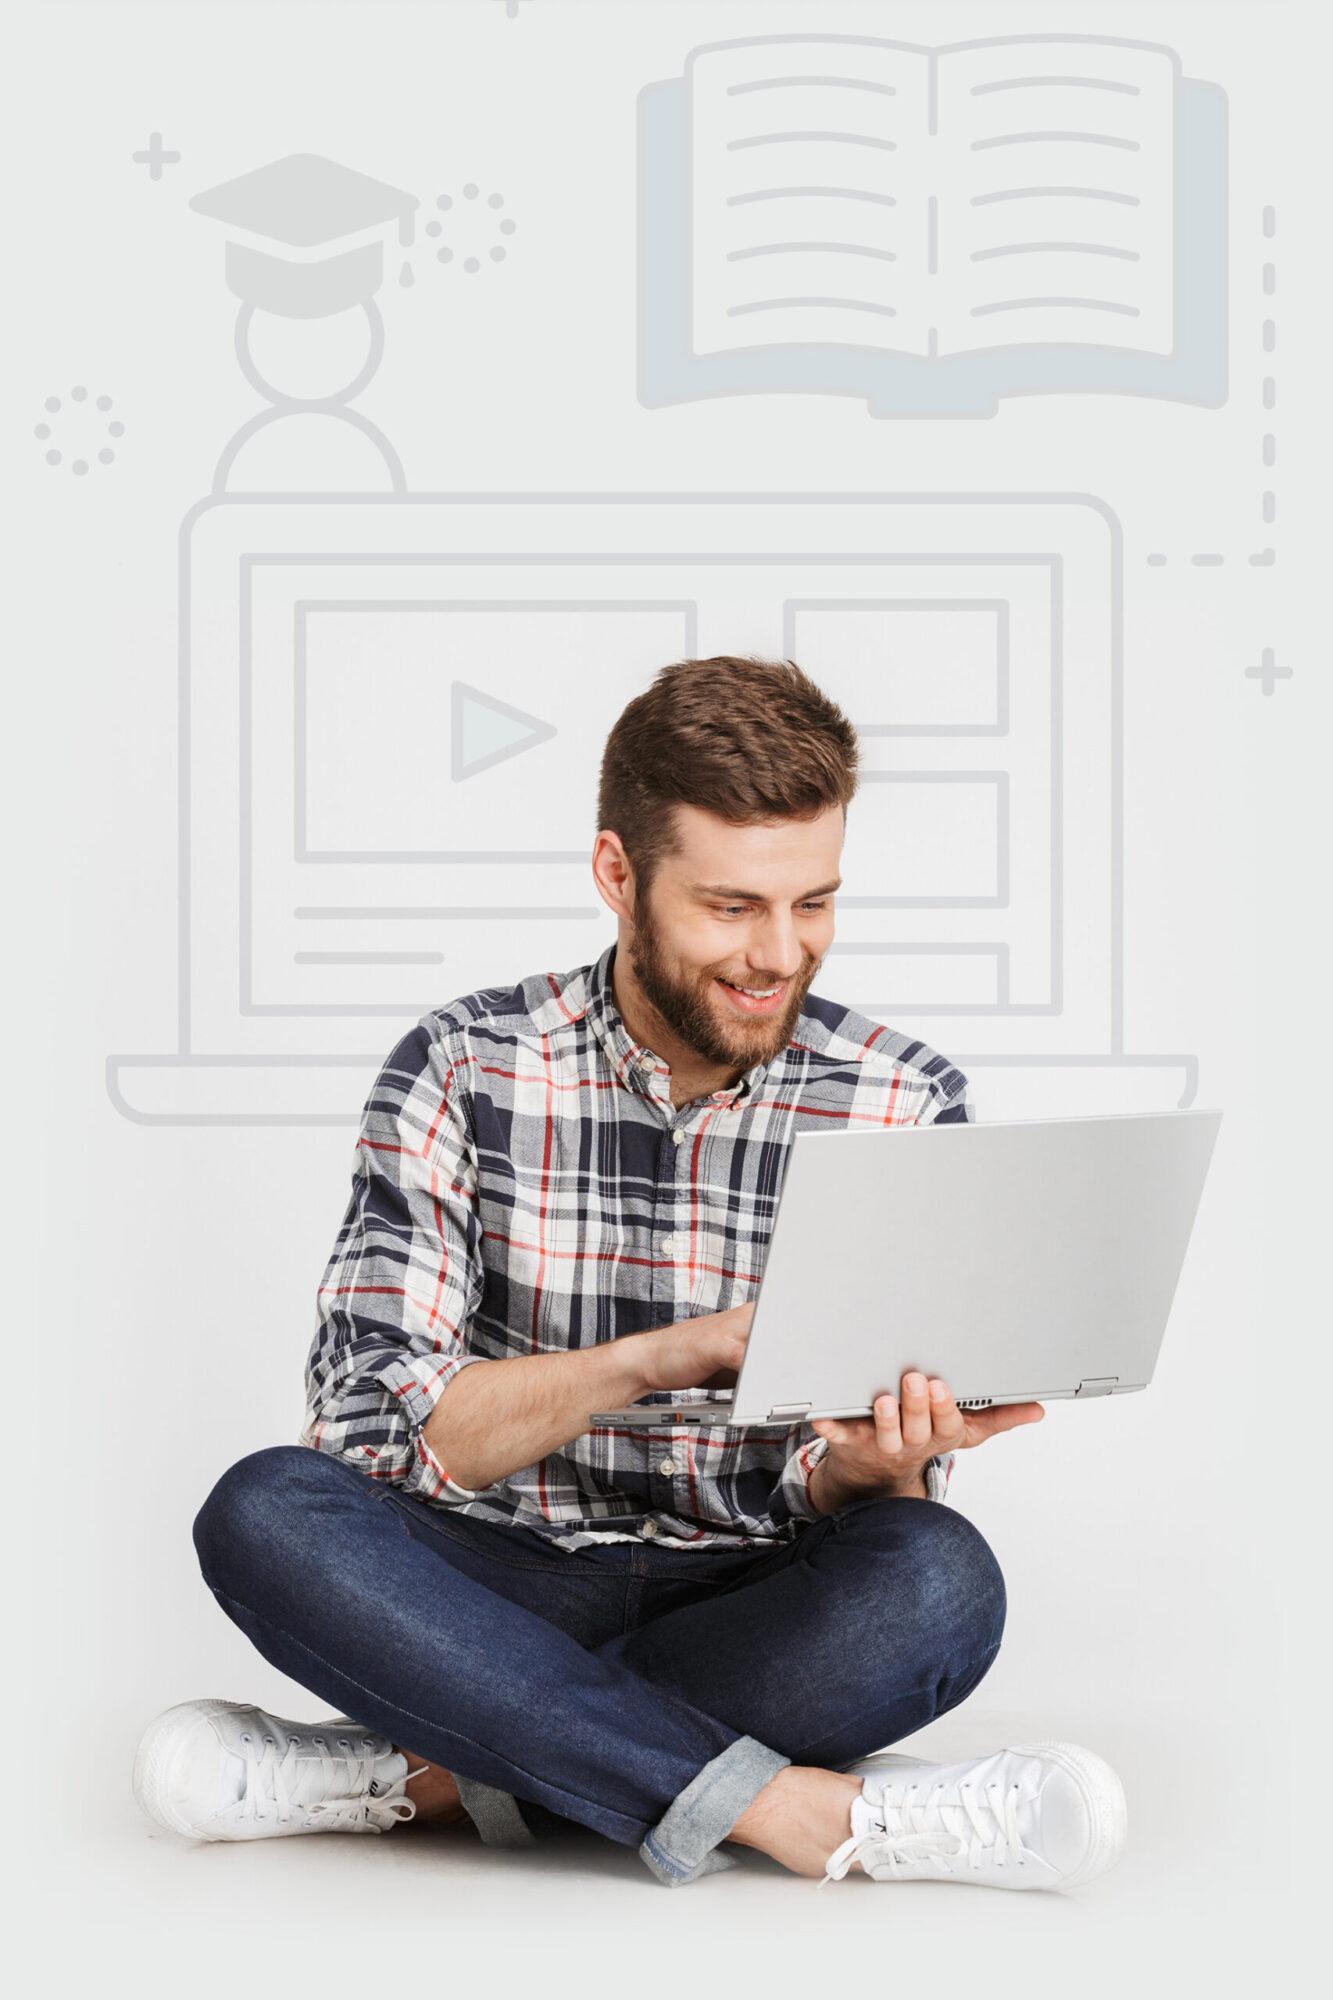 Online Pretrial Education